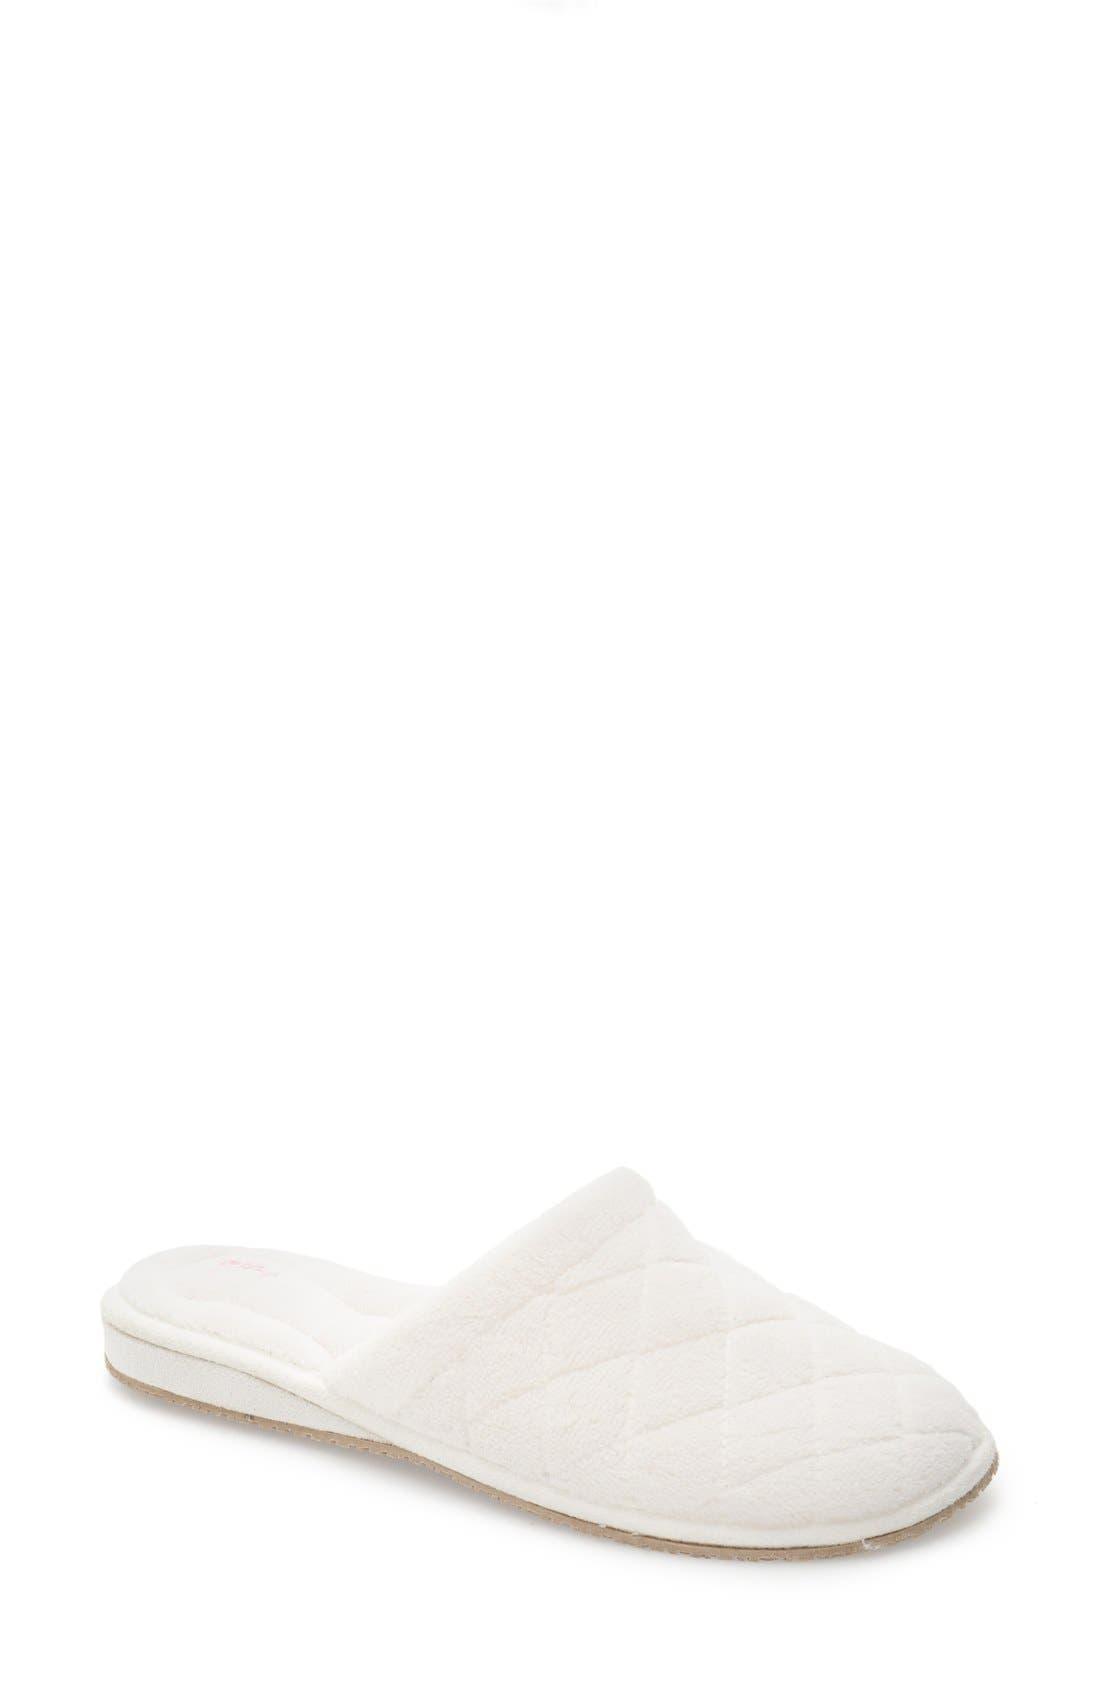 'Aria' Plush Slipper,                             Main thumbnail 1, color,                             White Polyester